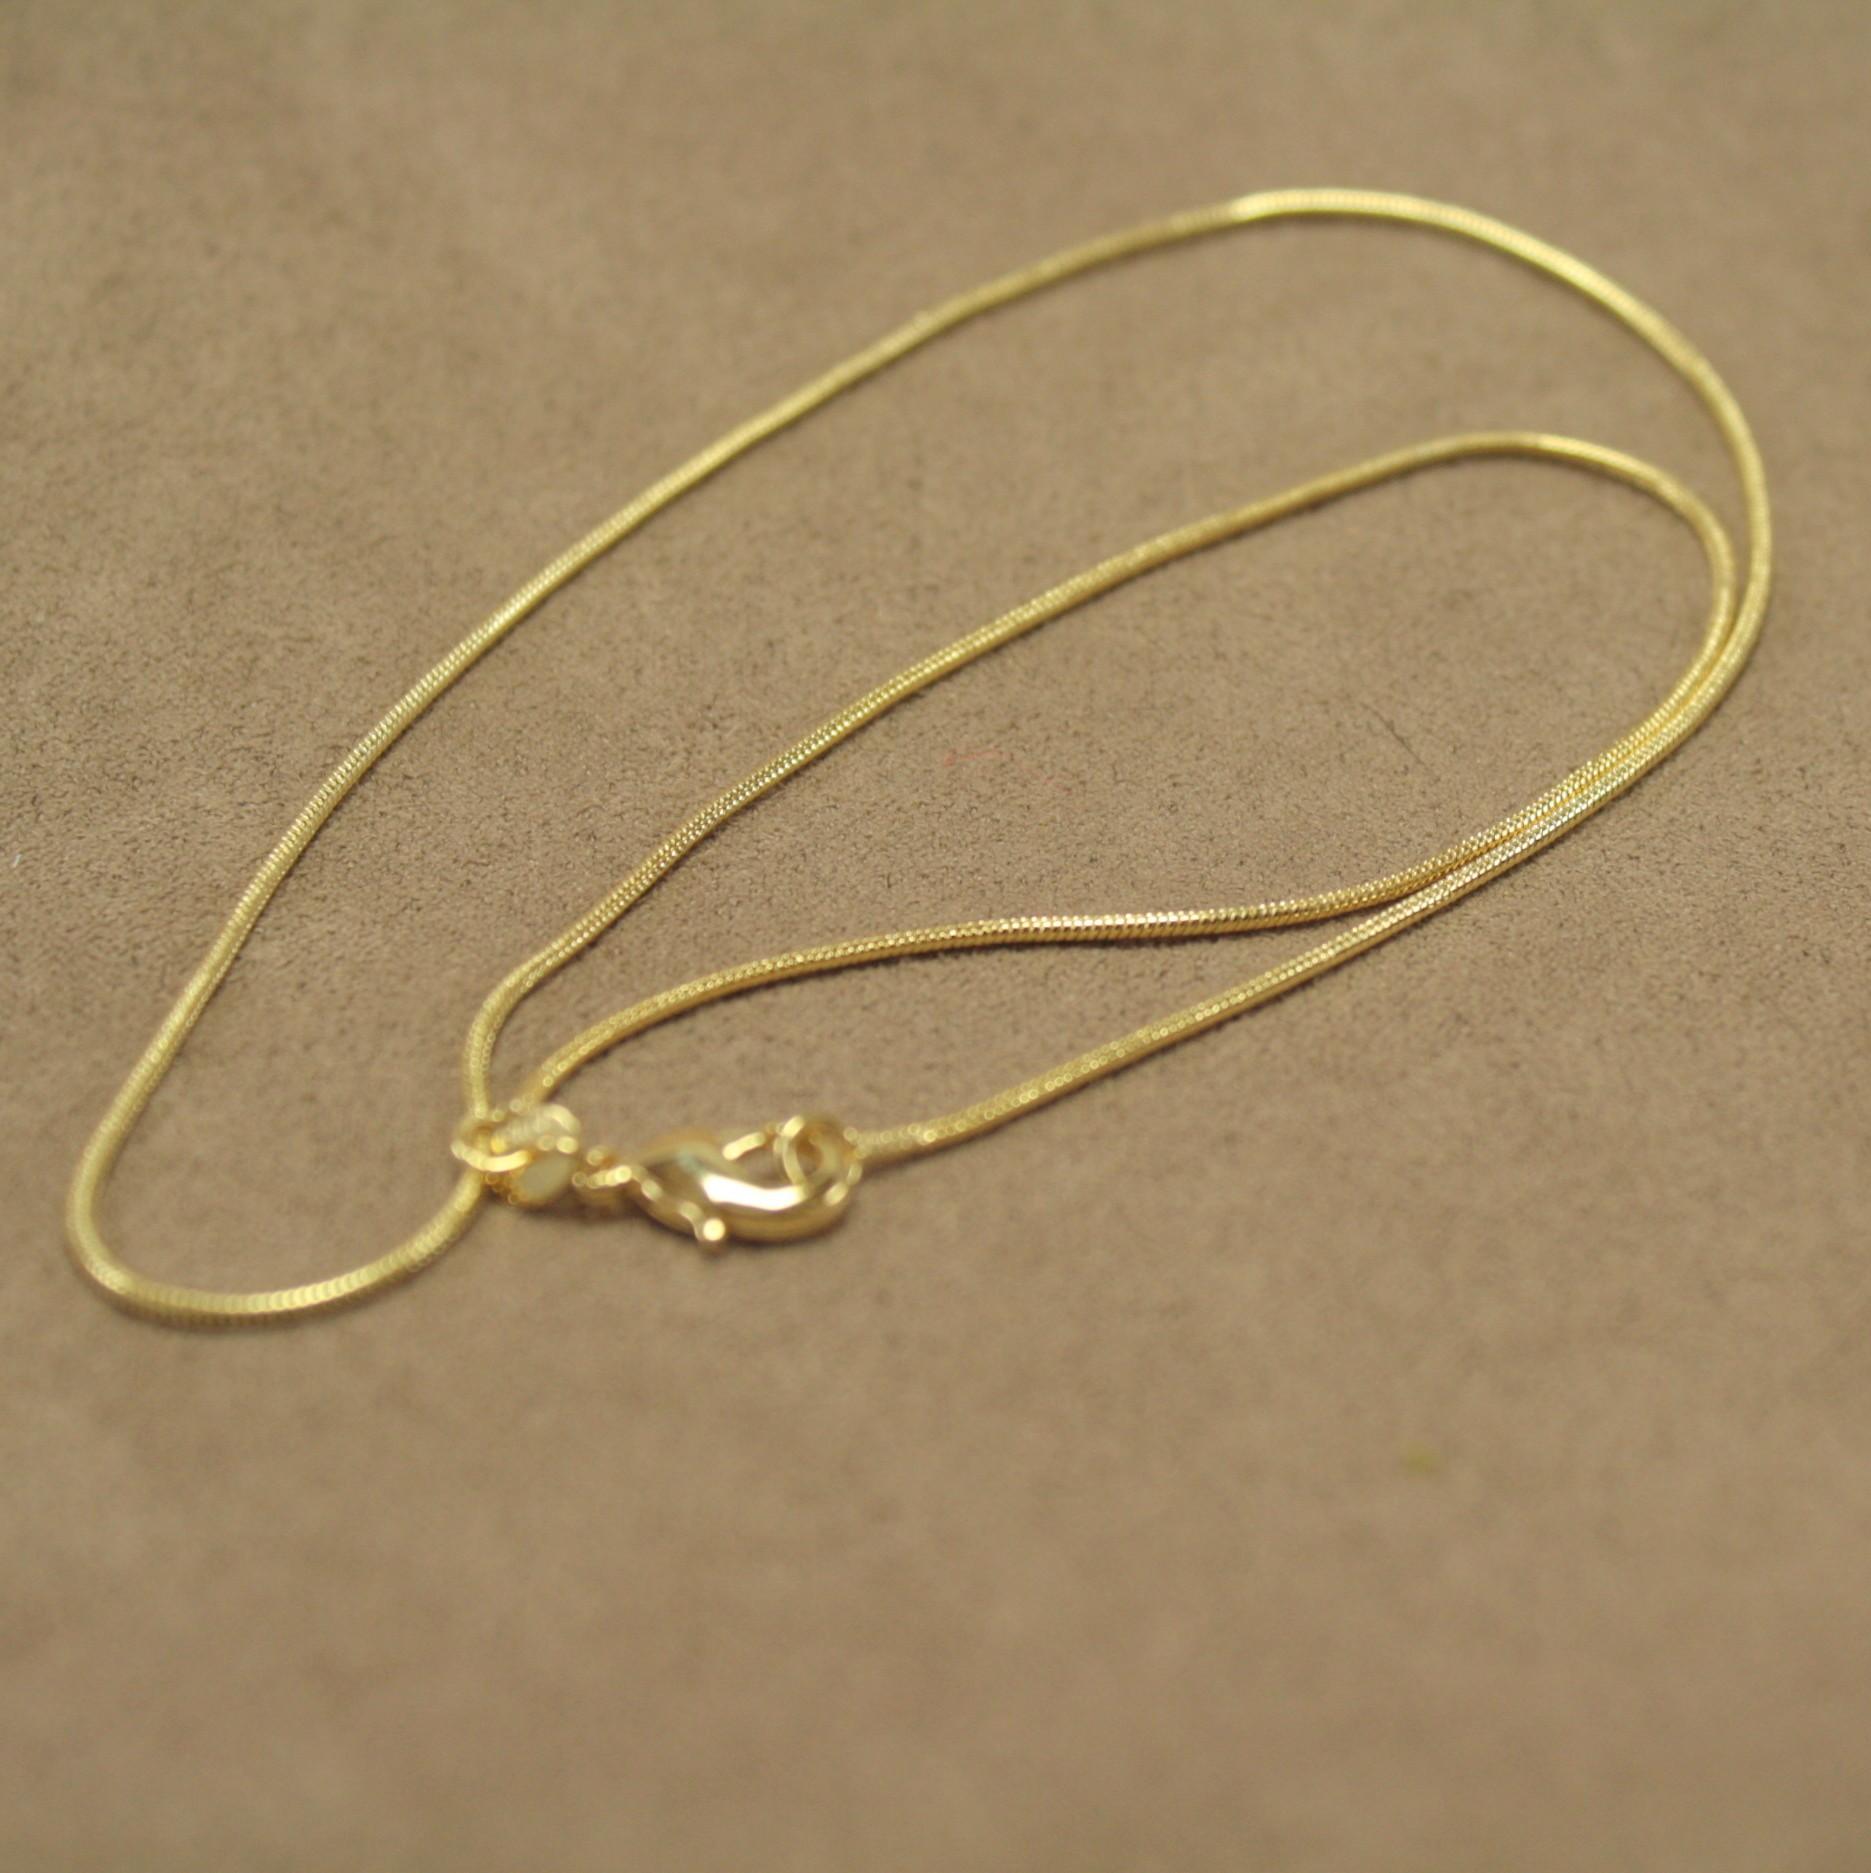 e98a216daa0 Guldfarvet halskæde, u/ vedhæng ...